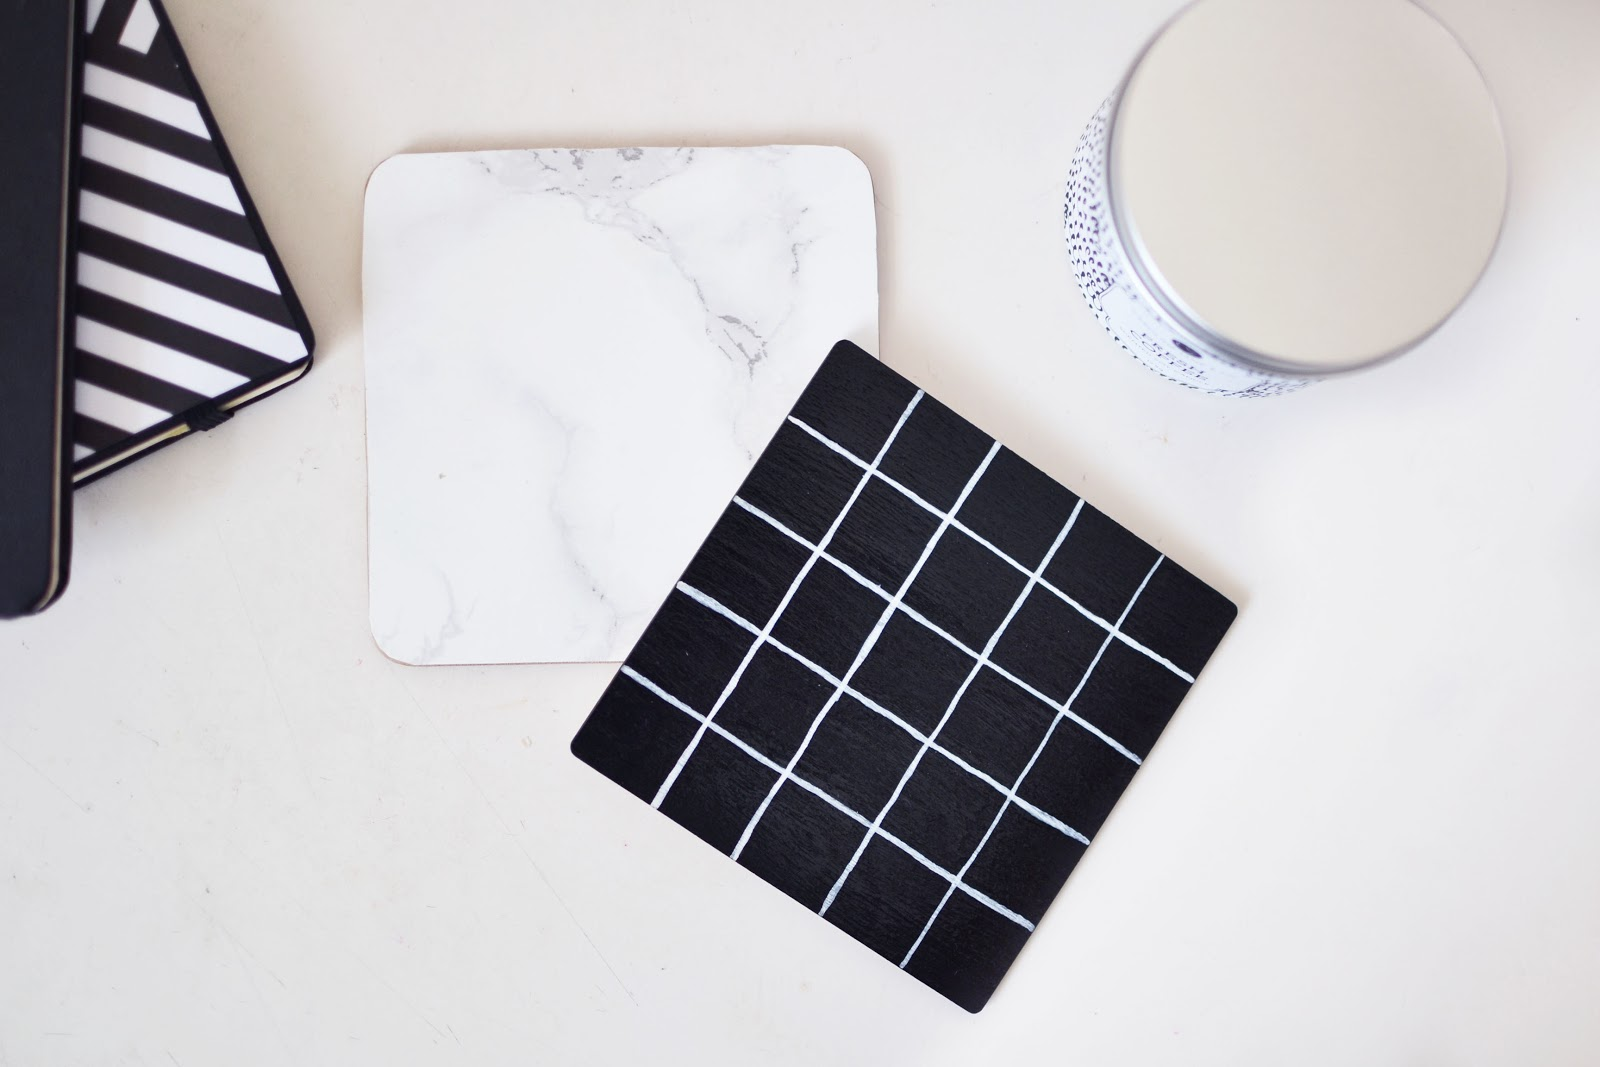 marble coaster, grid print coaster